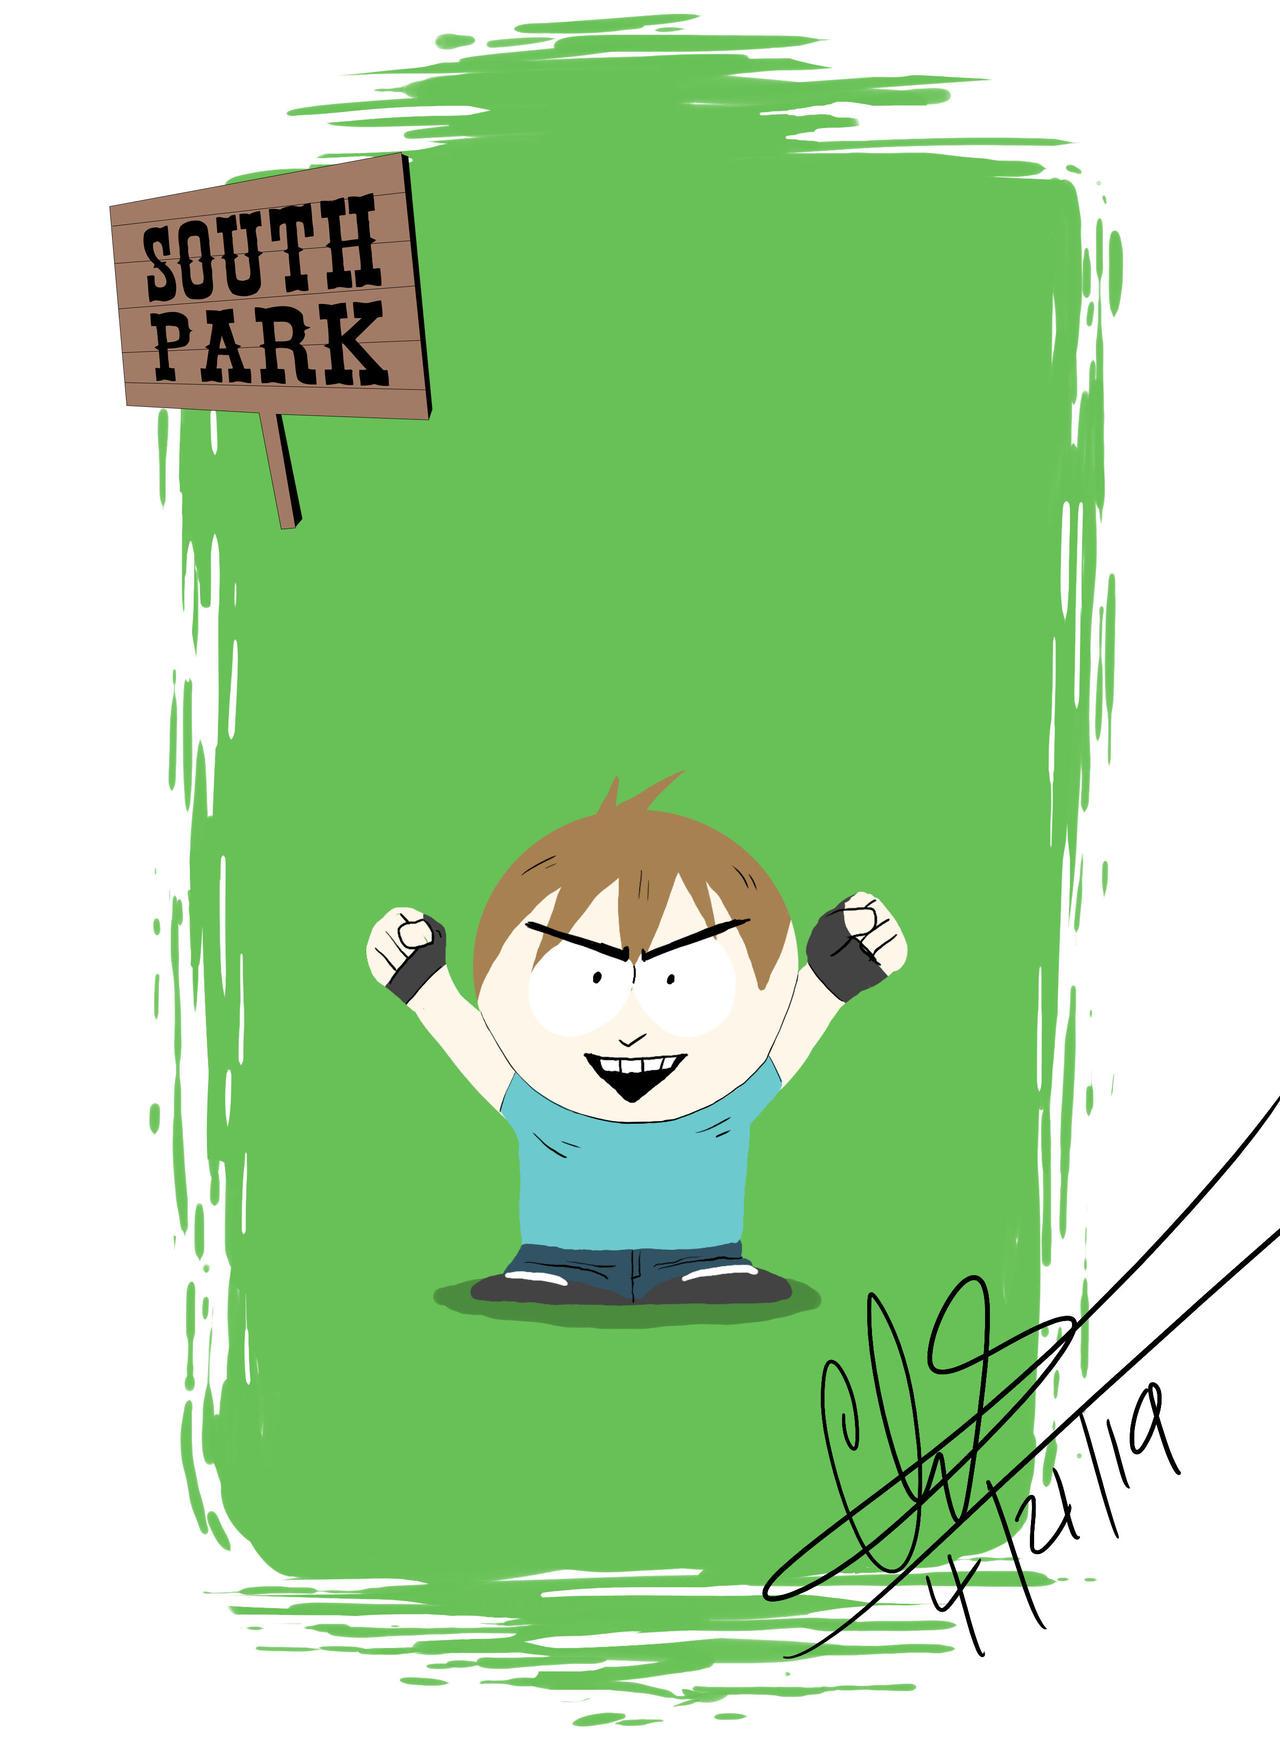 Park Art My WordPress Blog_View South Park Art Challenge Pictures